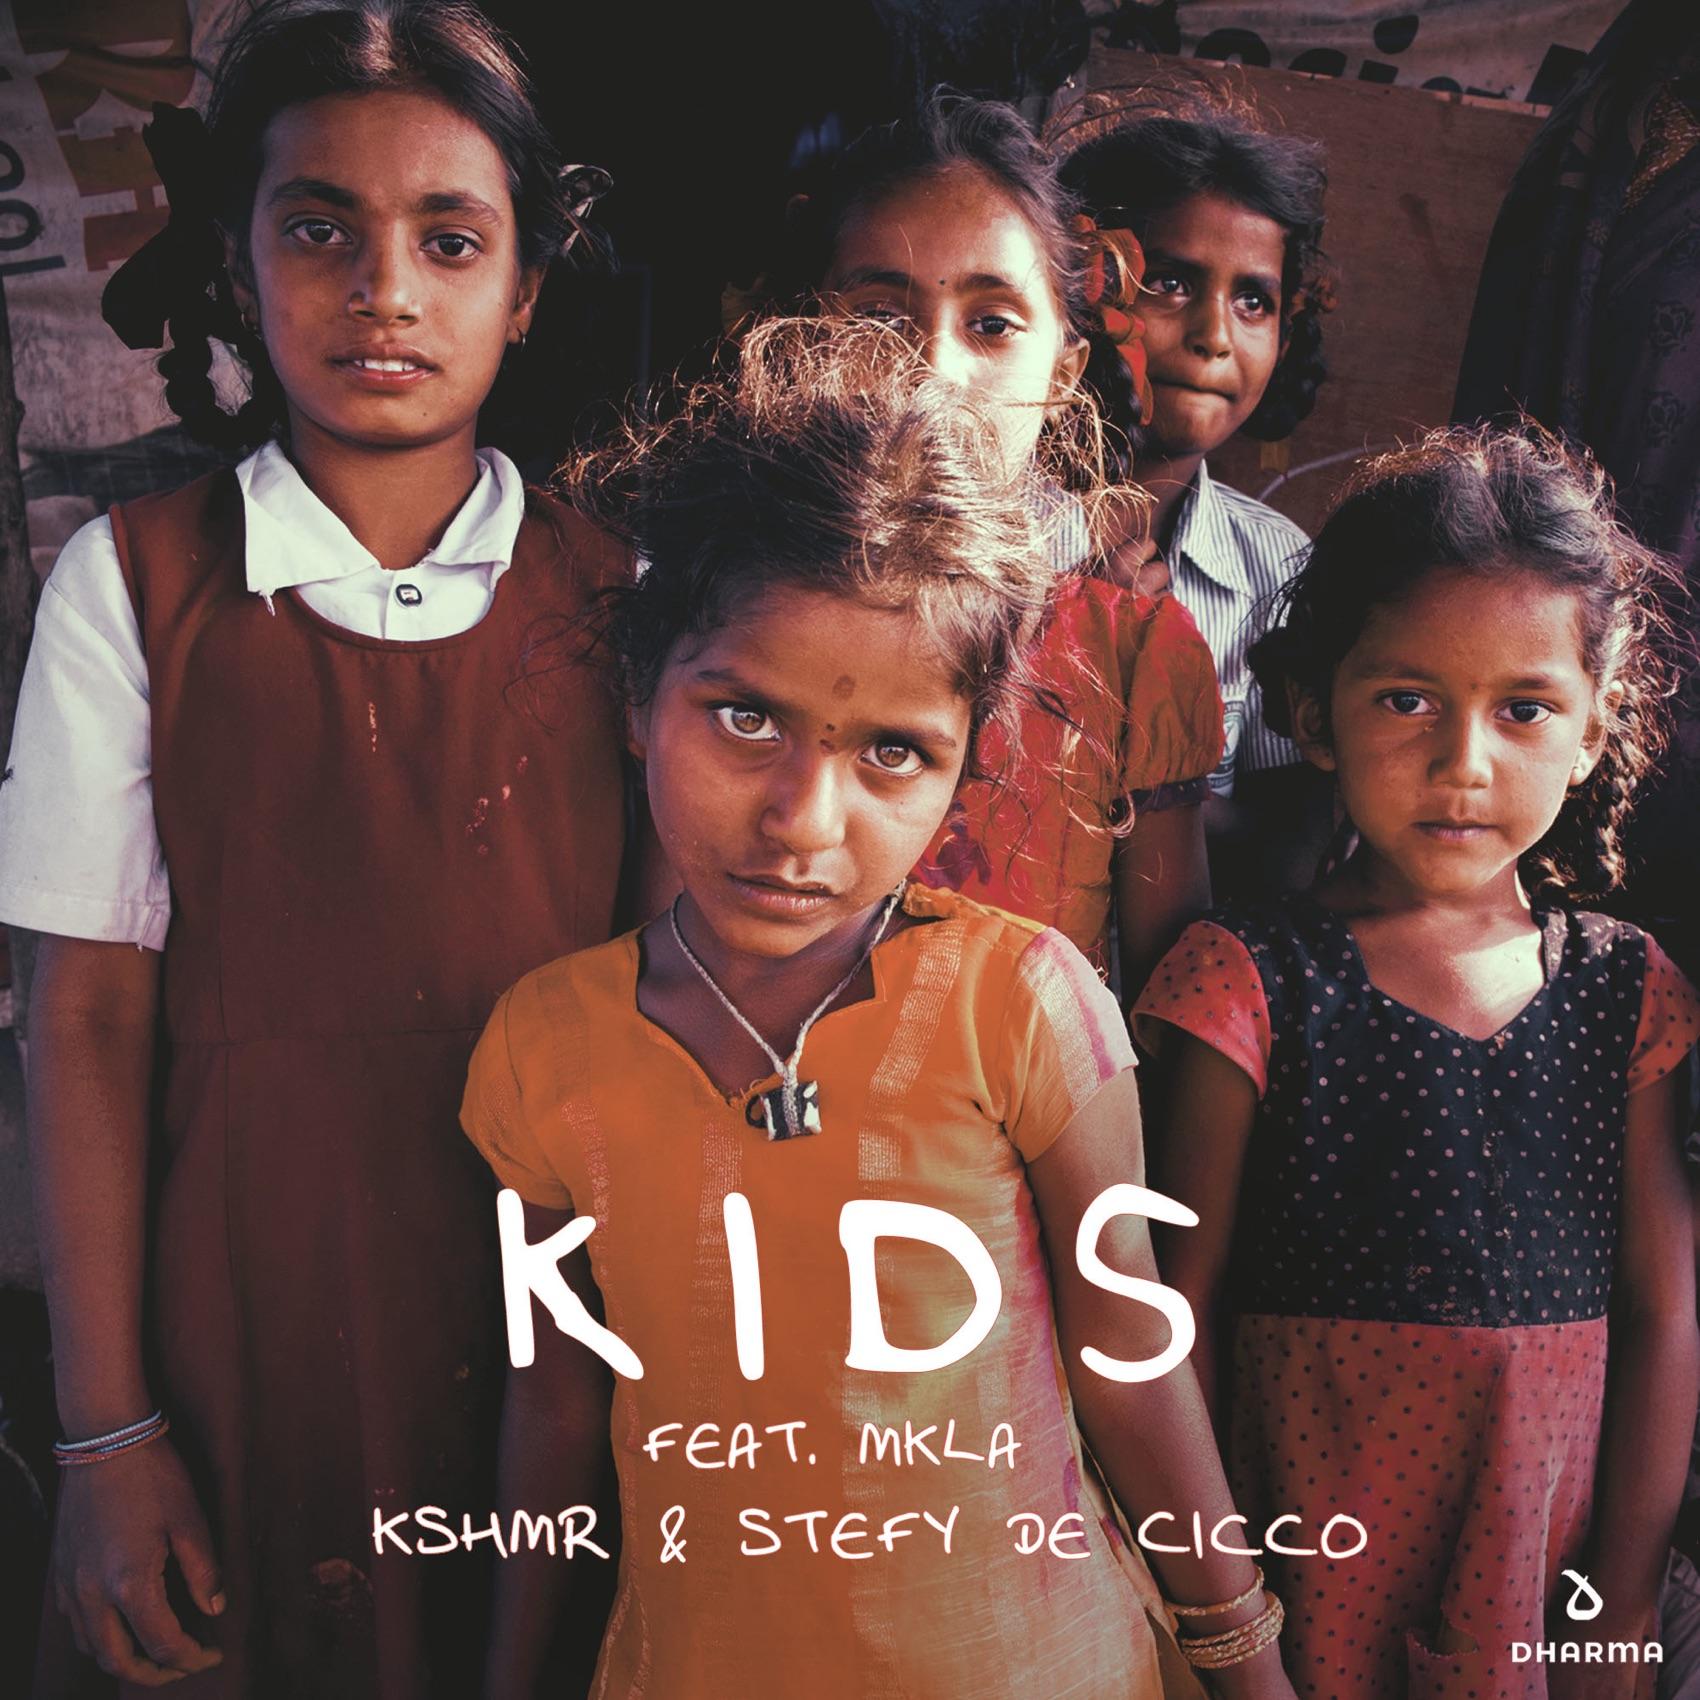 KSHMR, Stefy De Cicco - Kids (feat. MKLA)